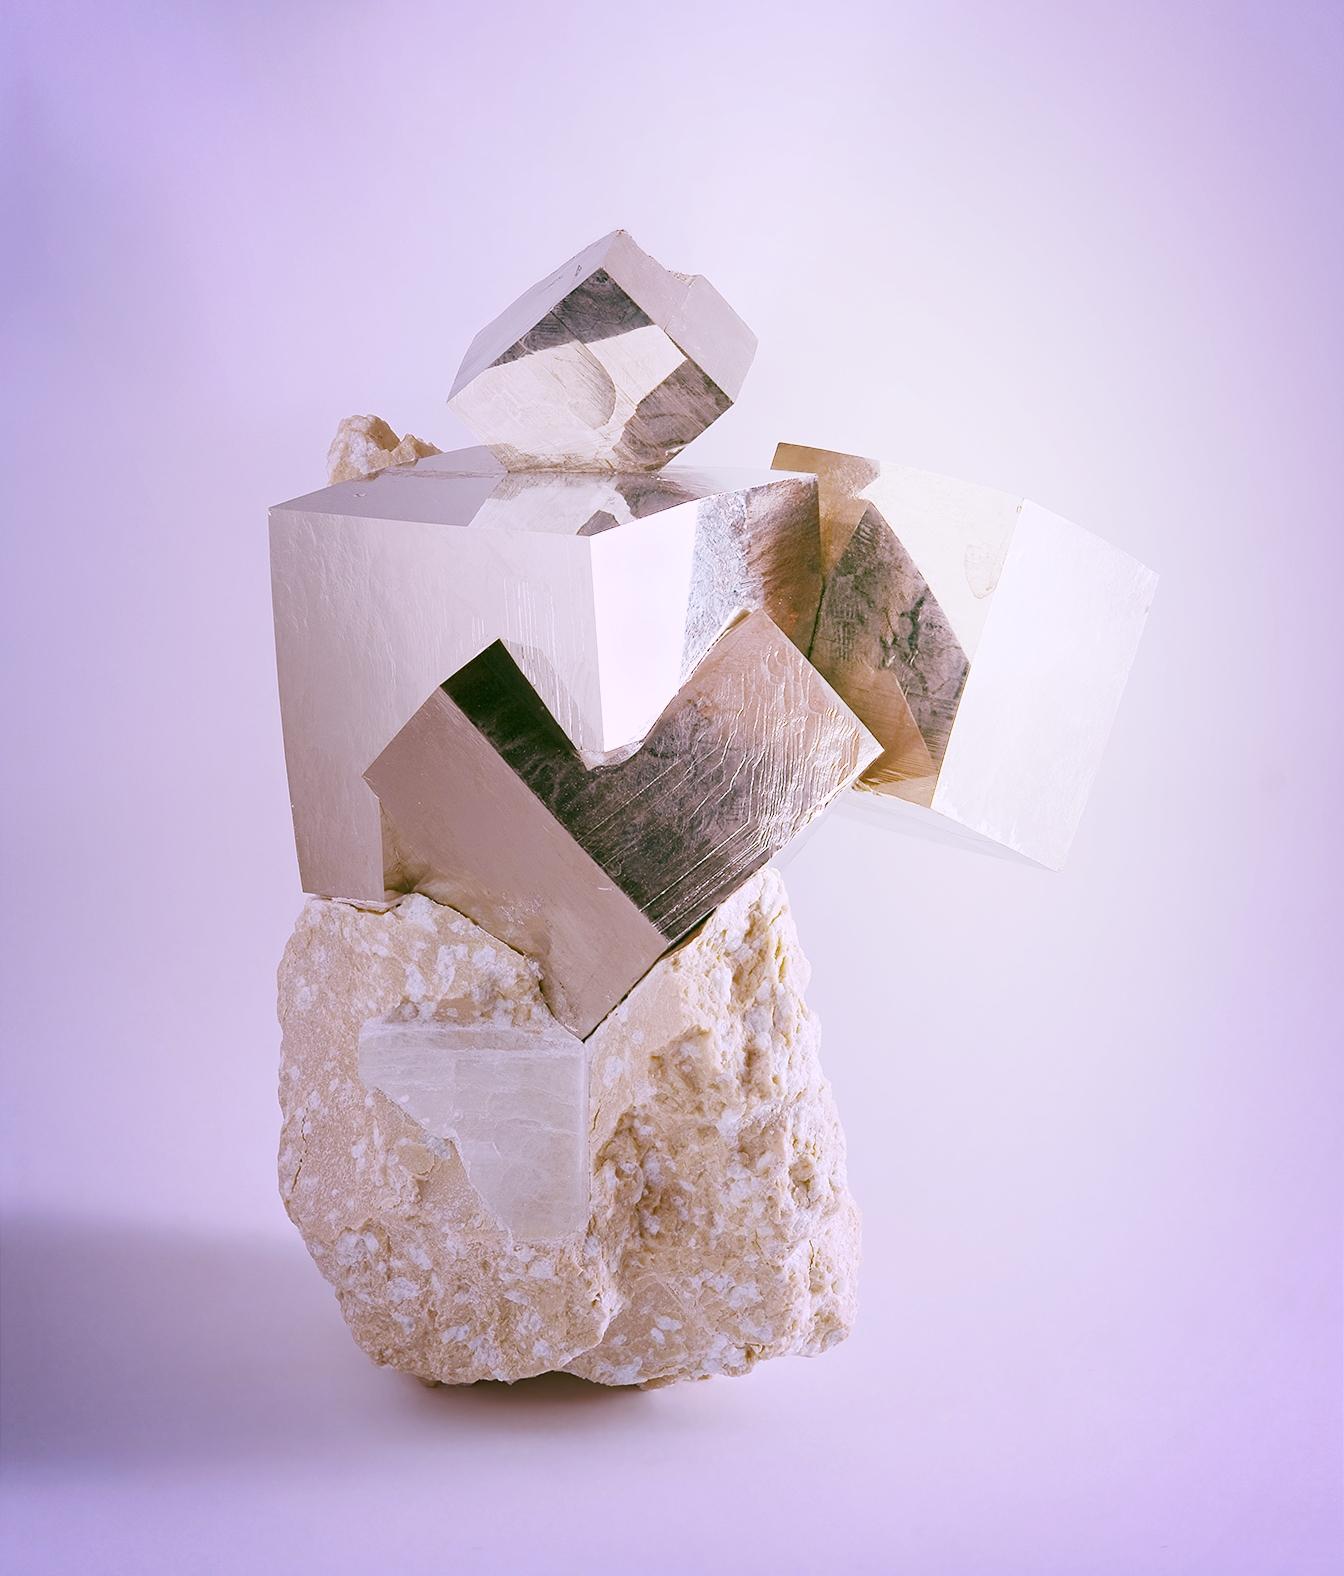 Pyrite_from_Ampliación_a_Victoria_Mine,_Navajún,_La_Rioja,_Spain_2.jpg